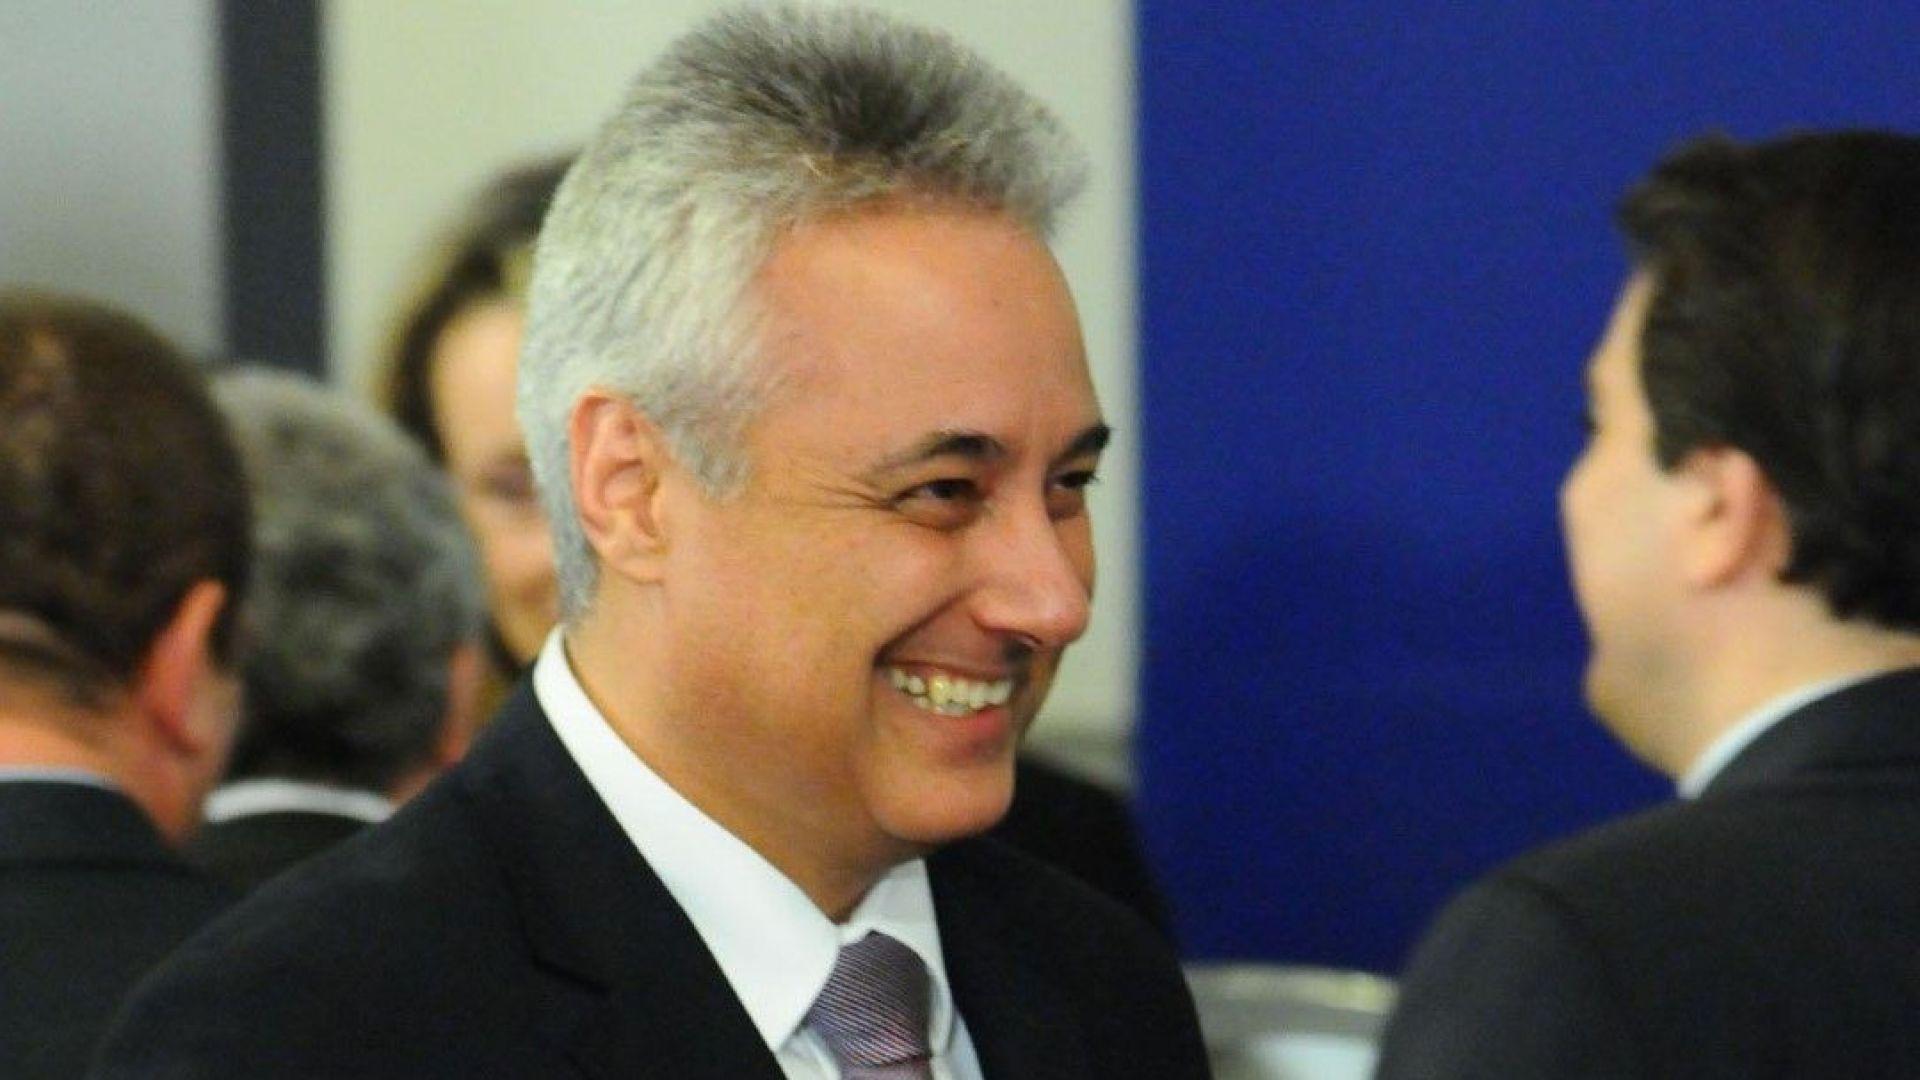 Връщат Марин Райков и Ради Найденов в България